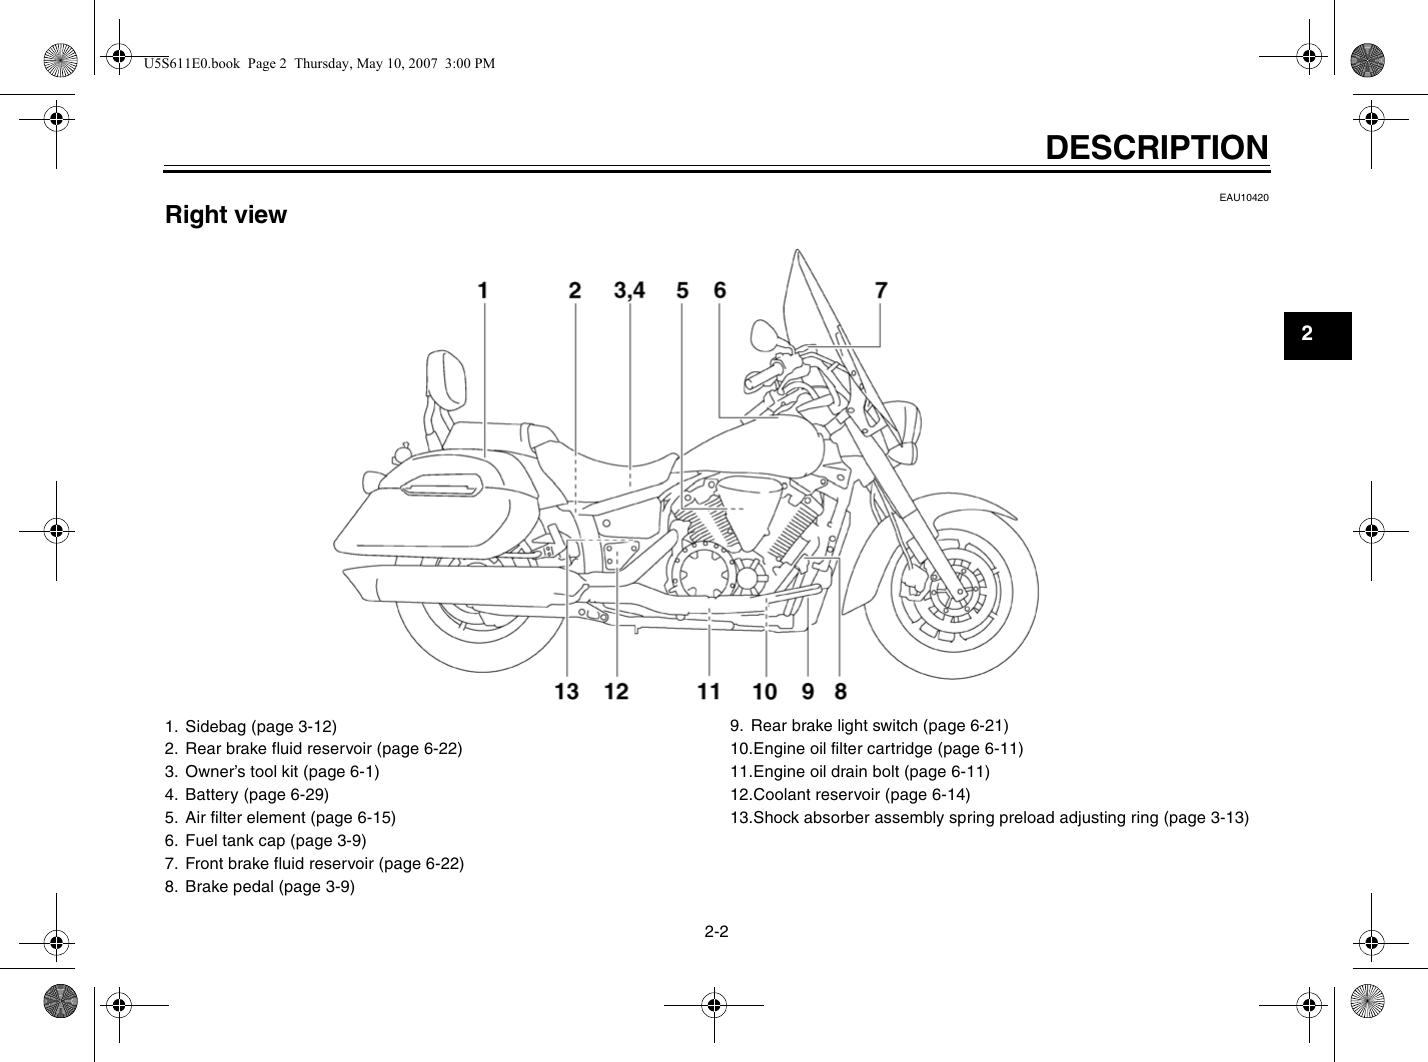 Yamaha 701 Cooling Diagram